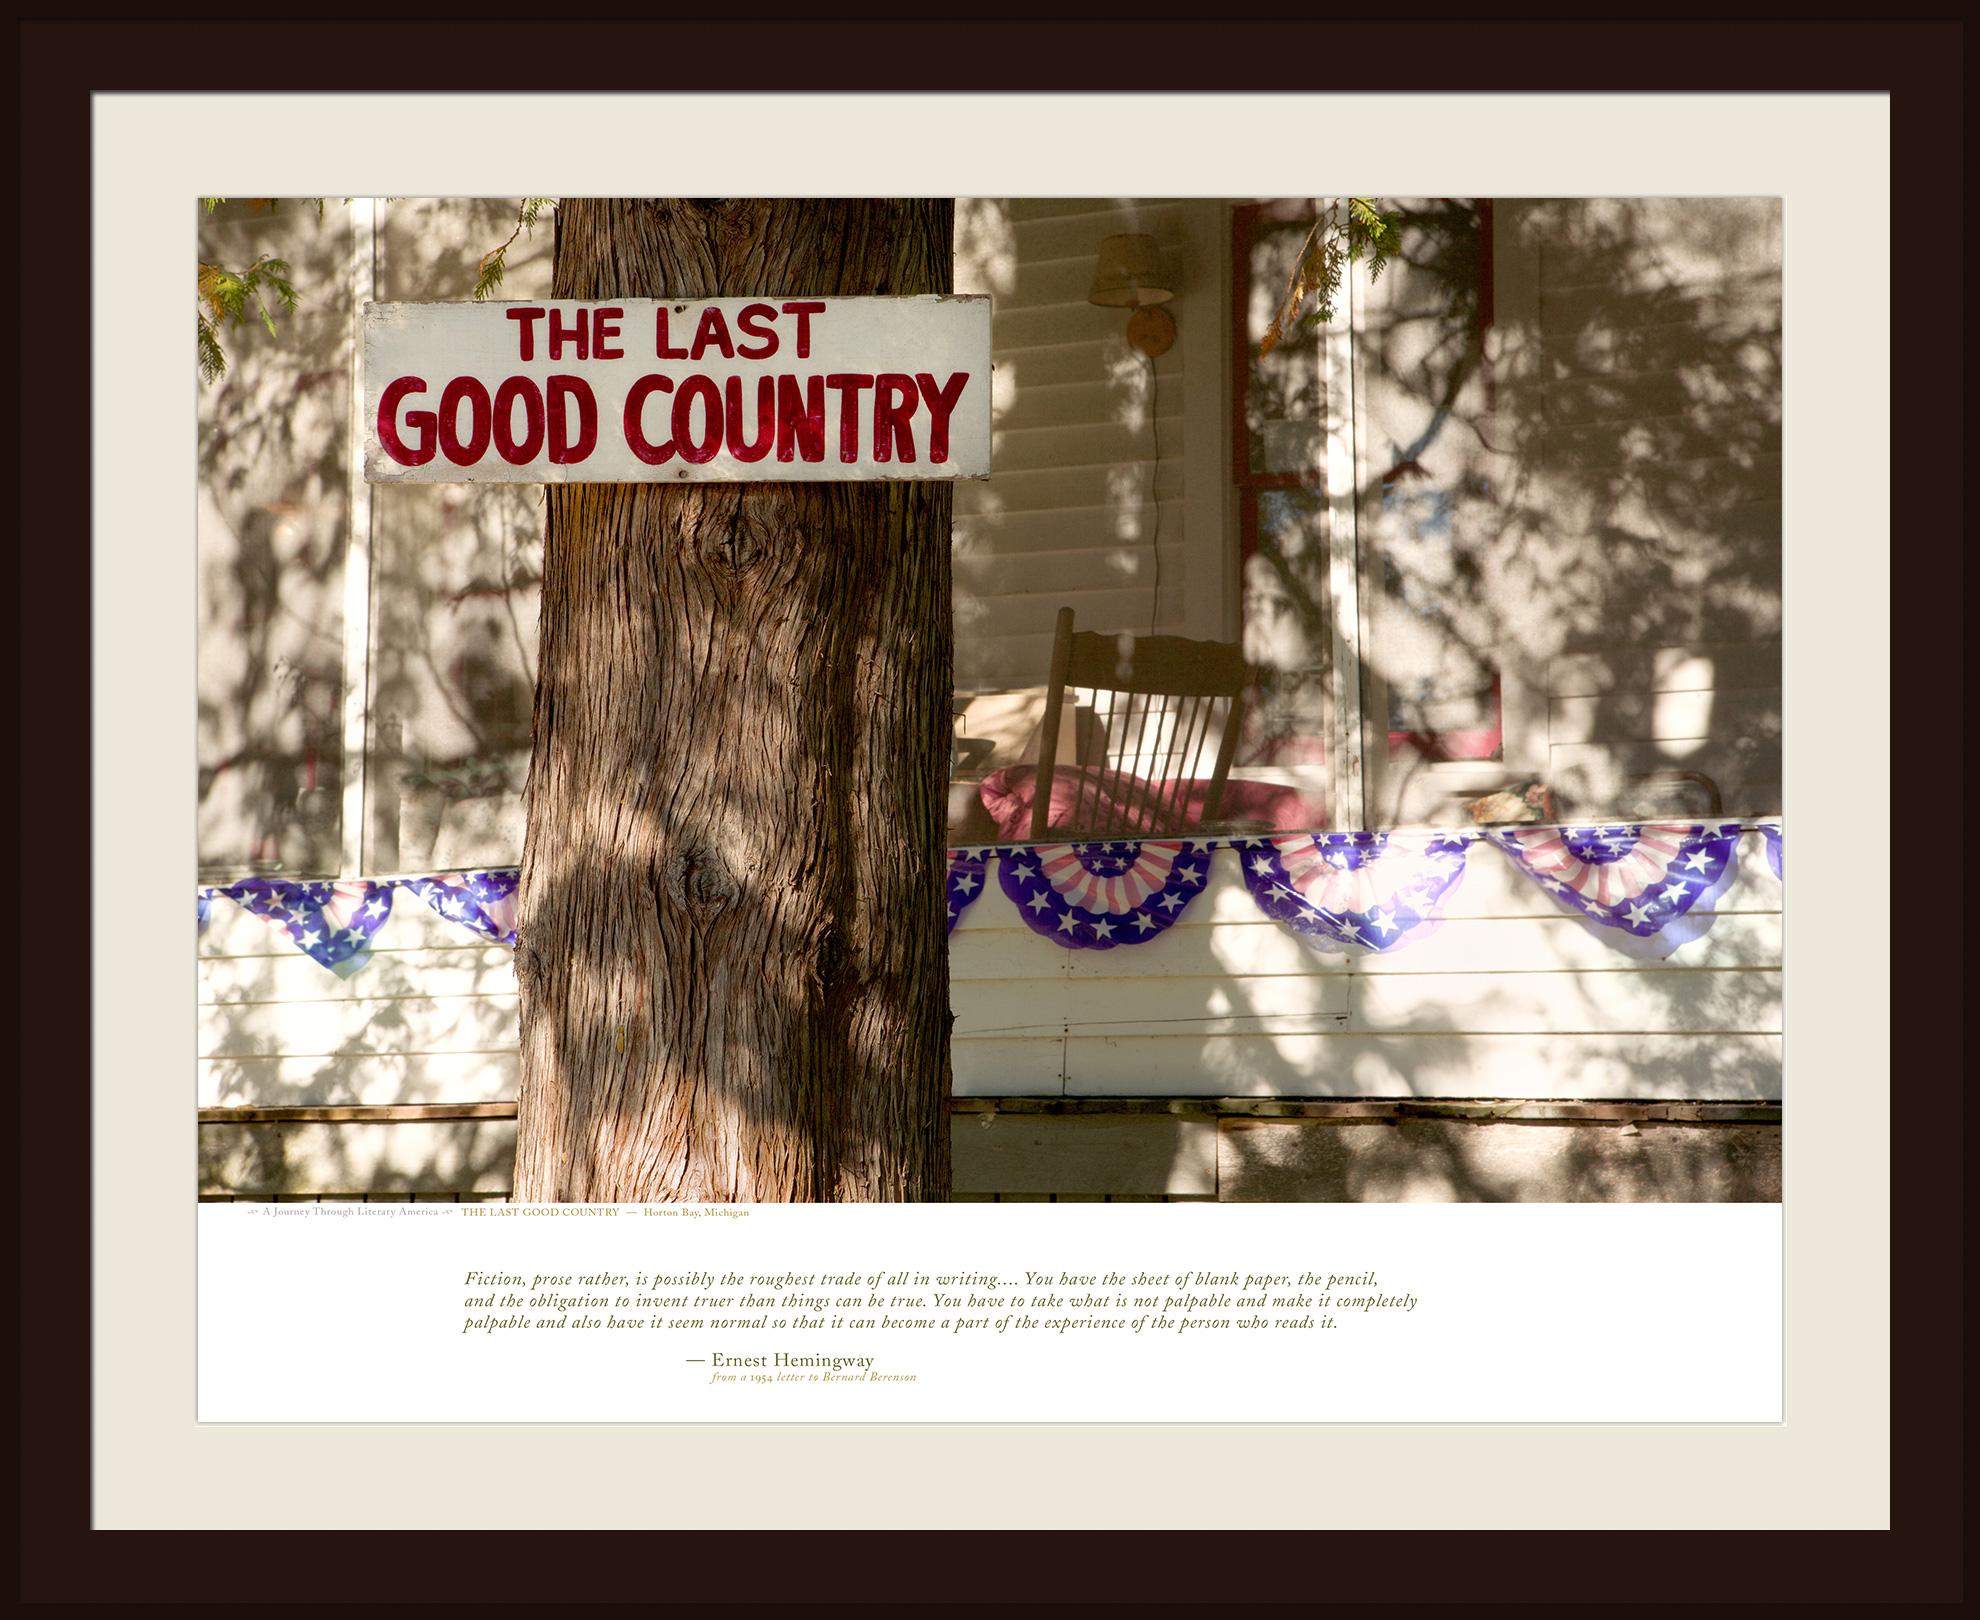 THE LAST GOOD COUNTRY — Horton Bay, Michigan